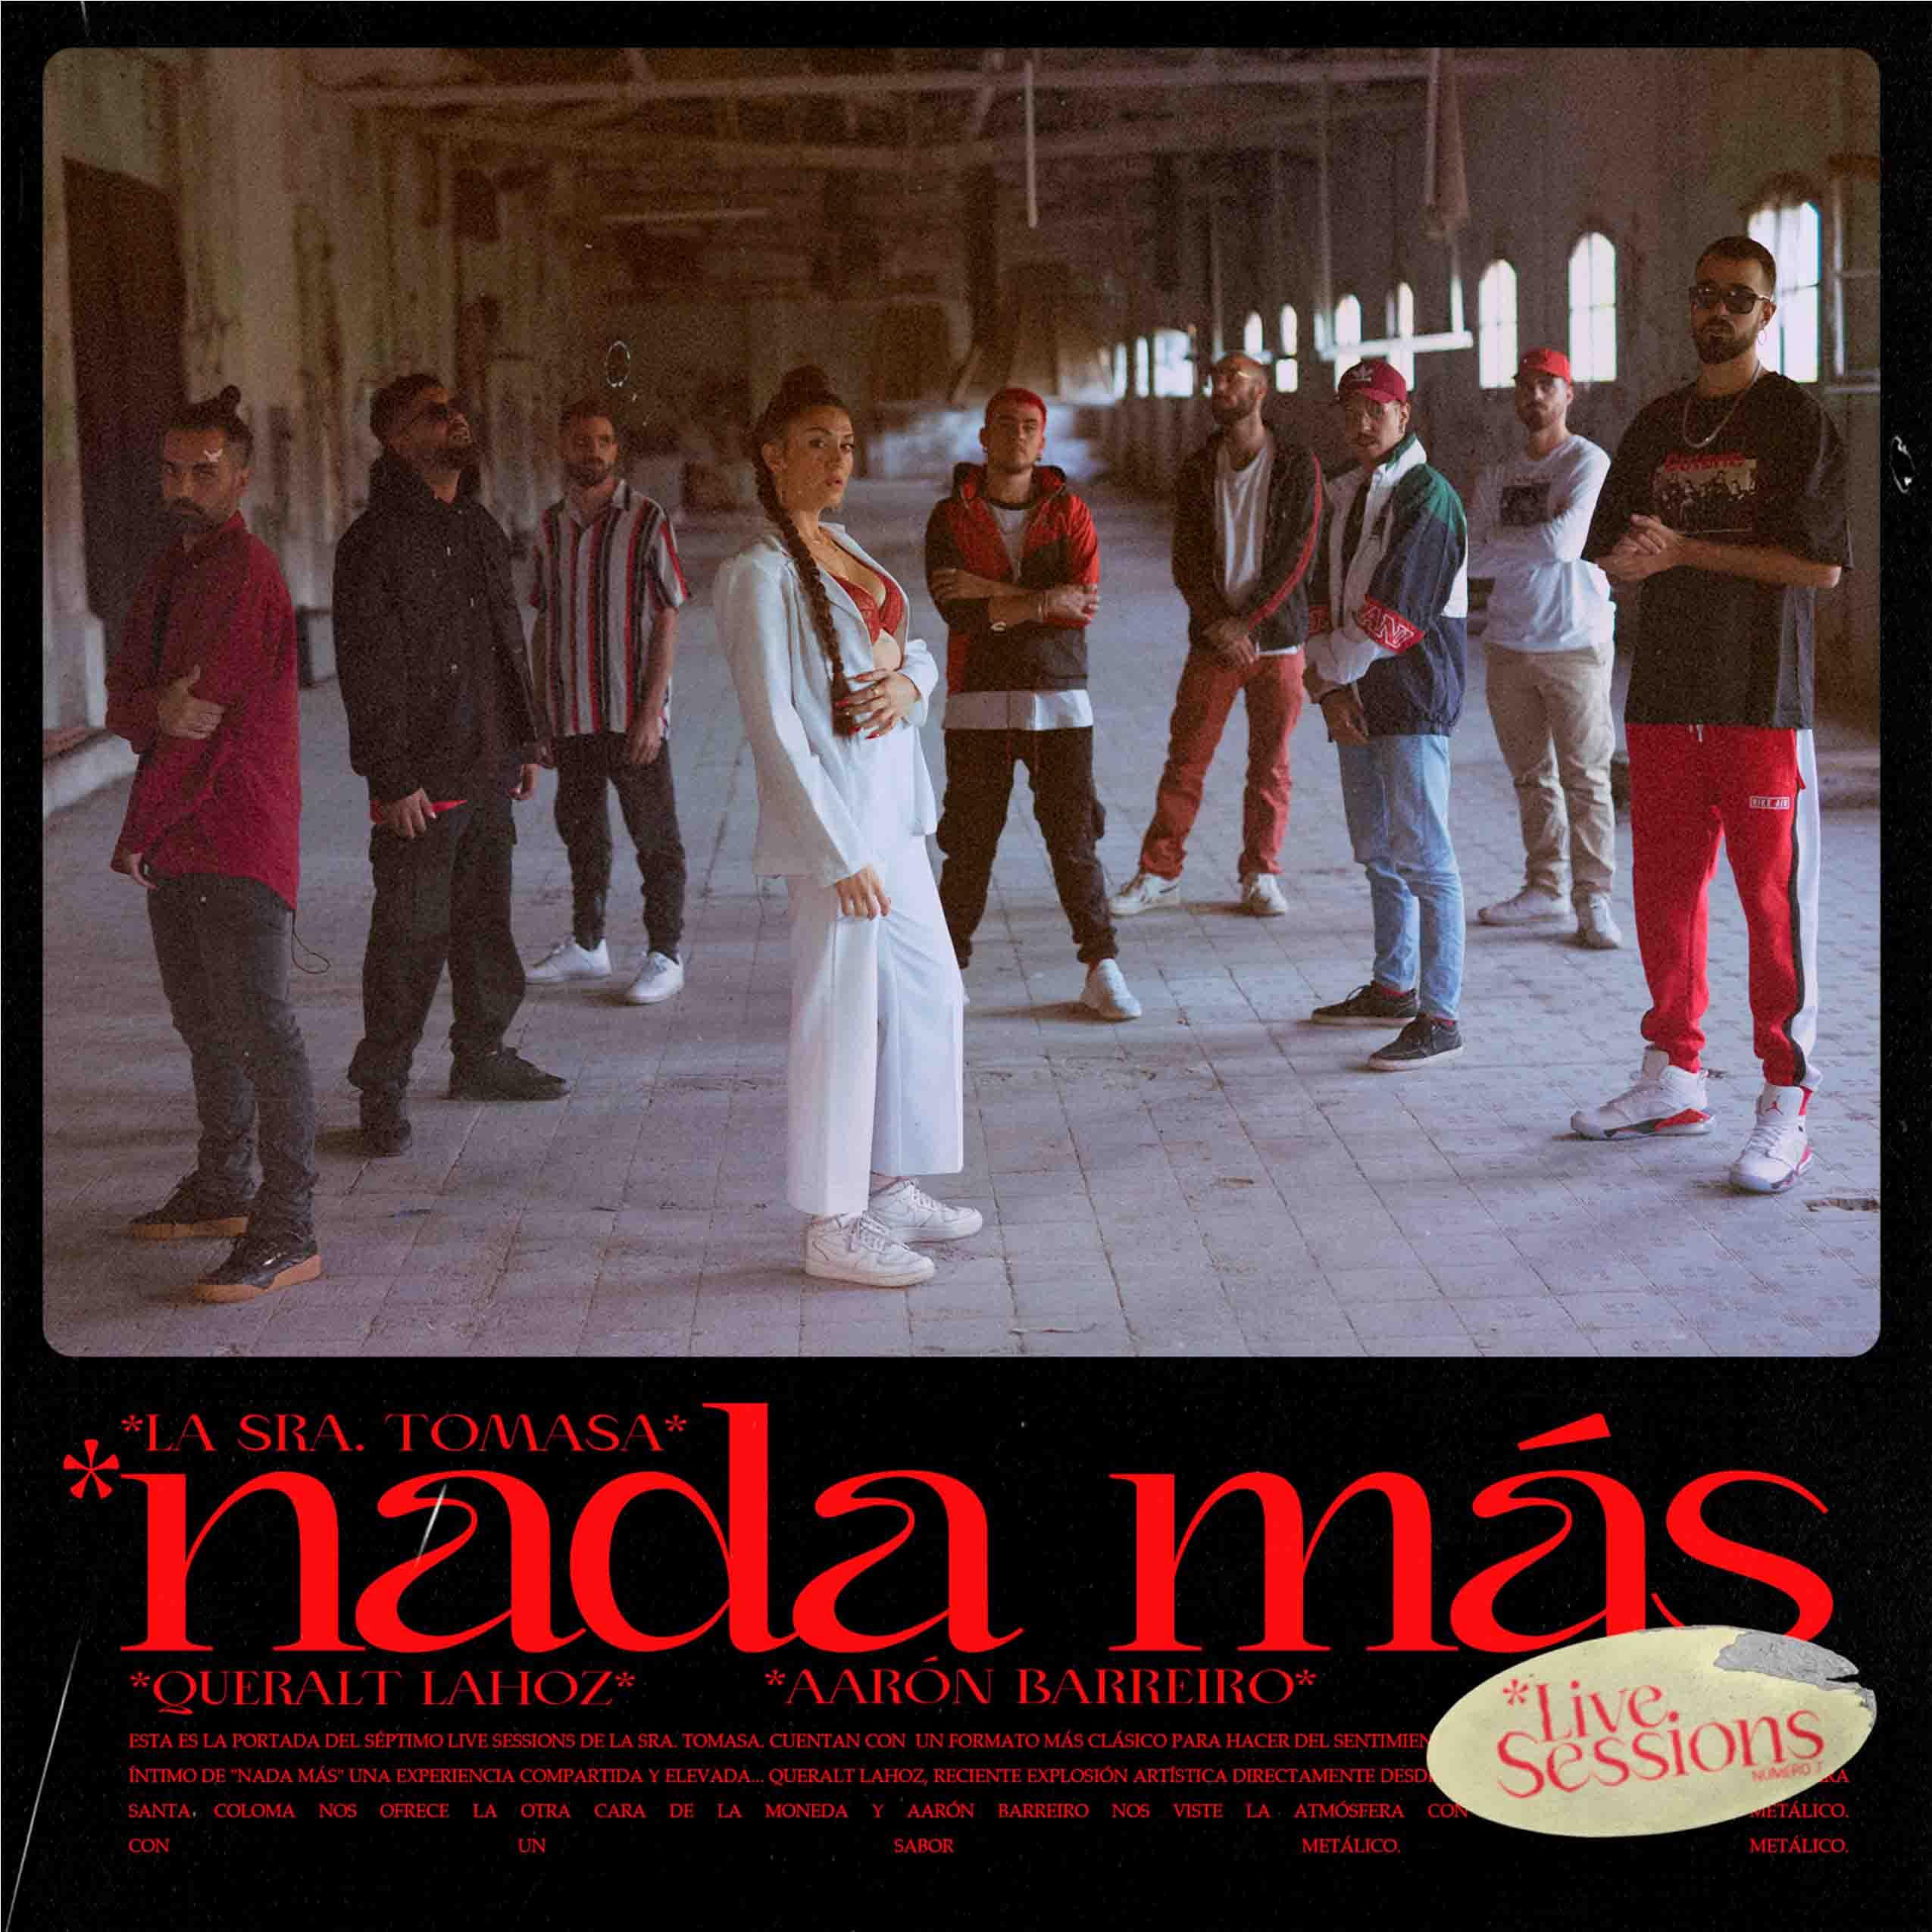 La Sra Tomasa - nada mas (live sessions)